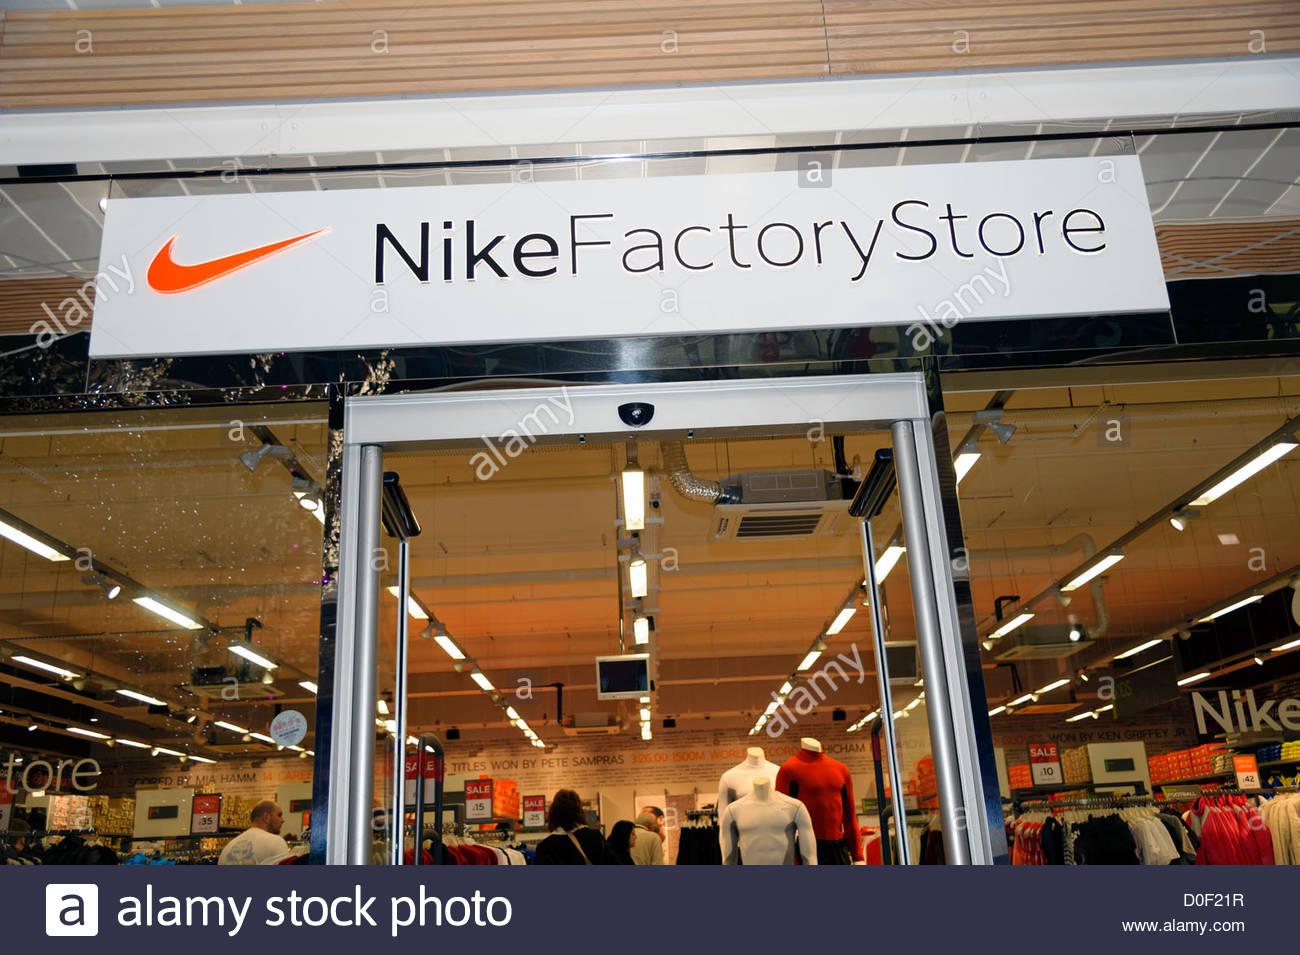 cheaper 69bc0 84ed6 Nike factory store, Gloucester Quays, UK. - Stock Image